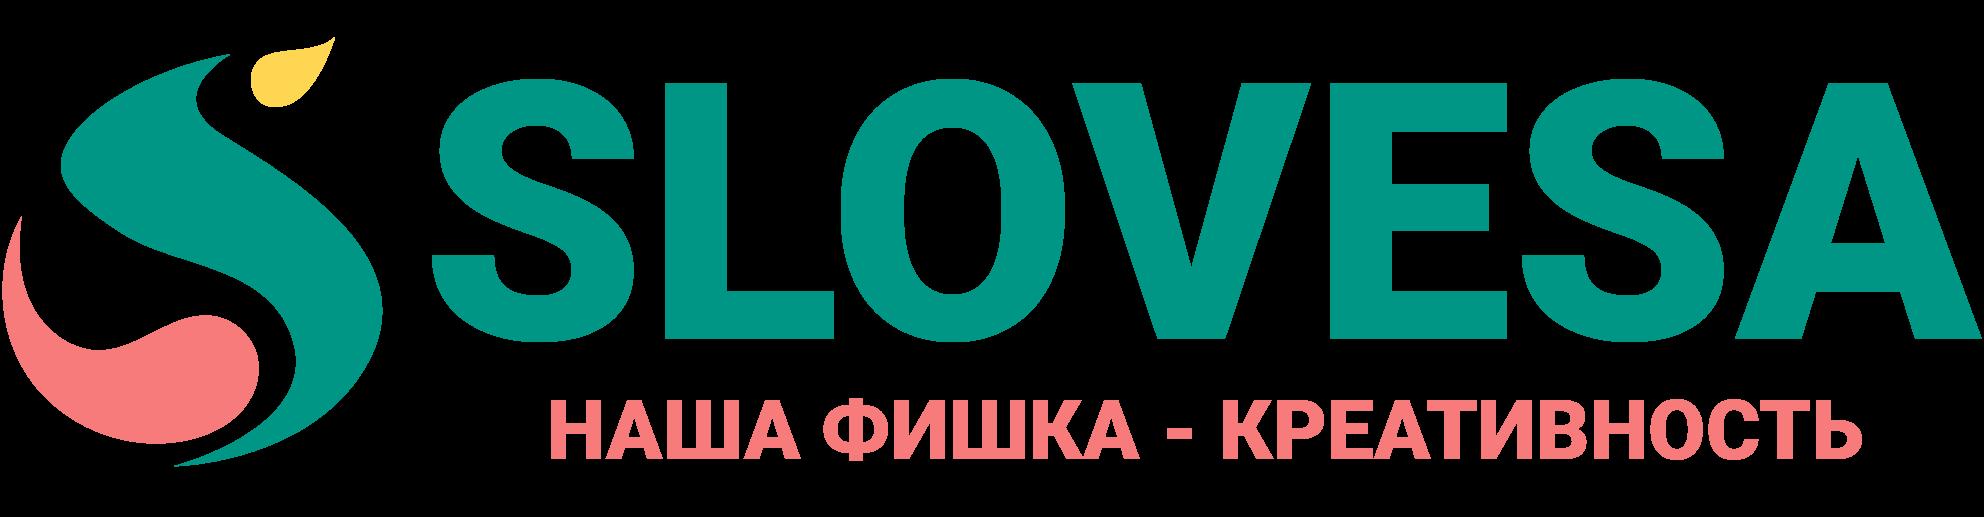 SLOVESA — журнал о развитии